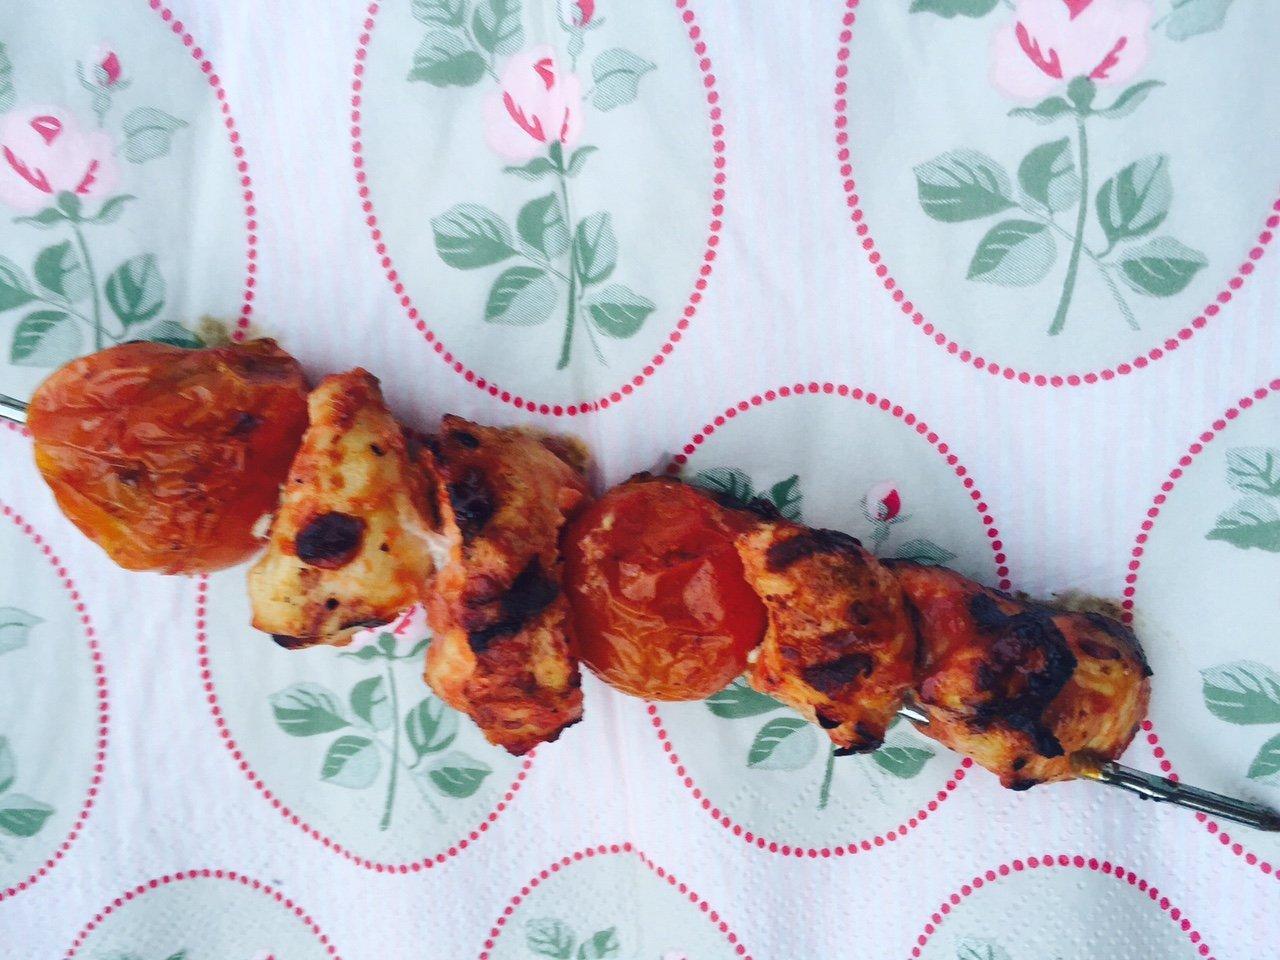 Kip tomaten spiesen recept foodblog Foodinista